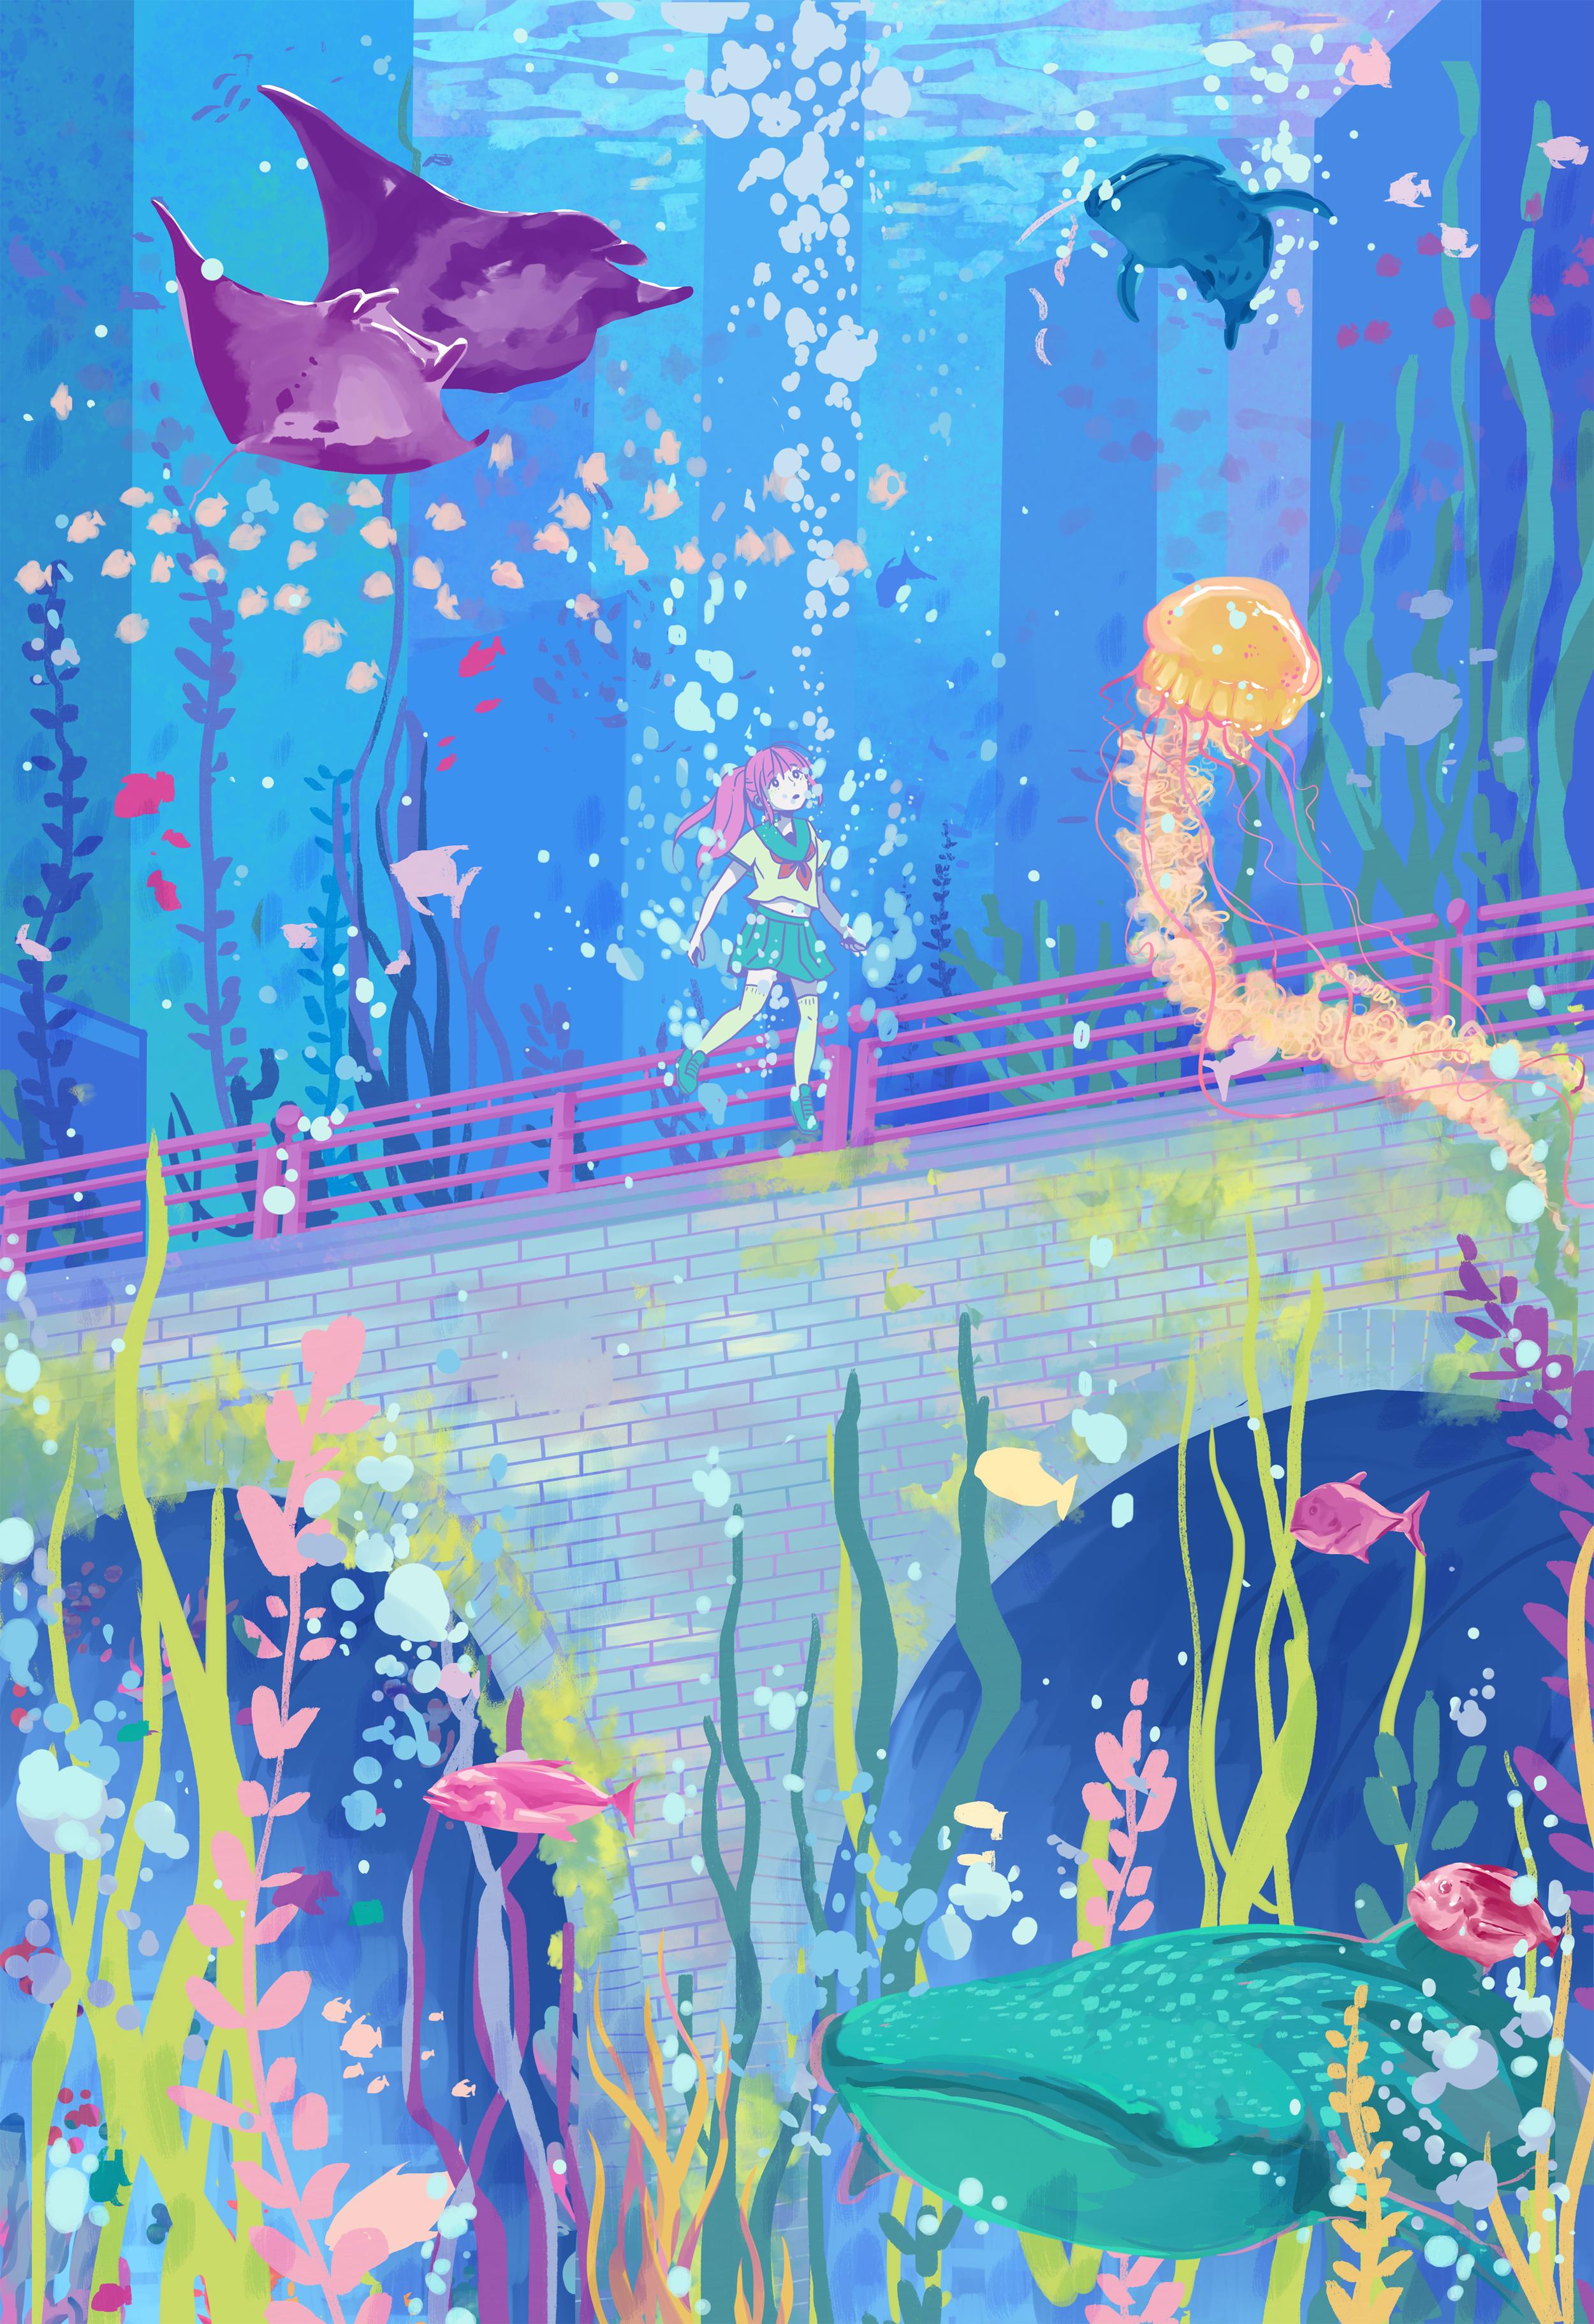 Oceans   Original Illustration 2019.